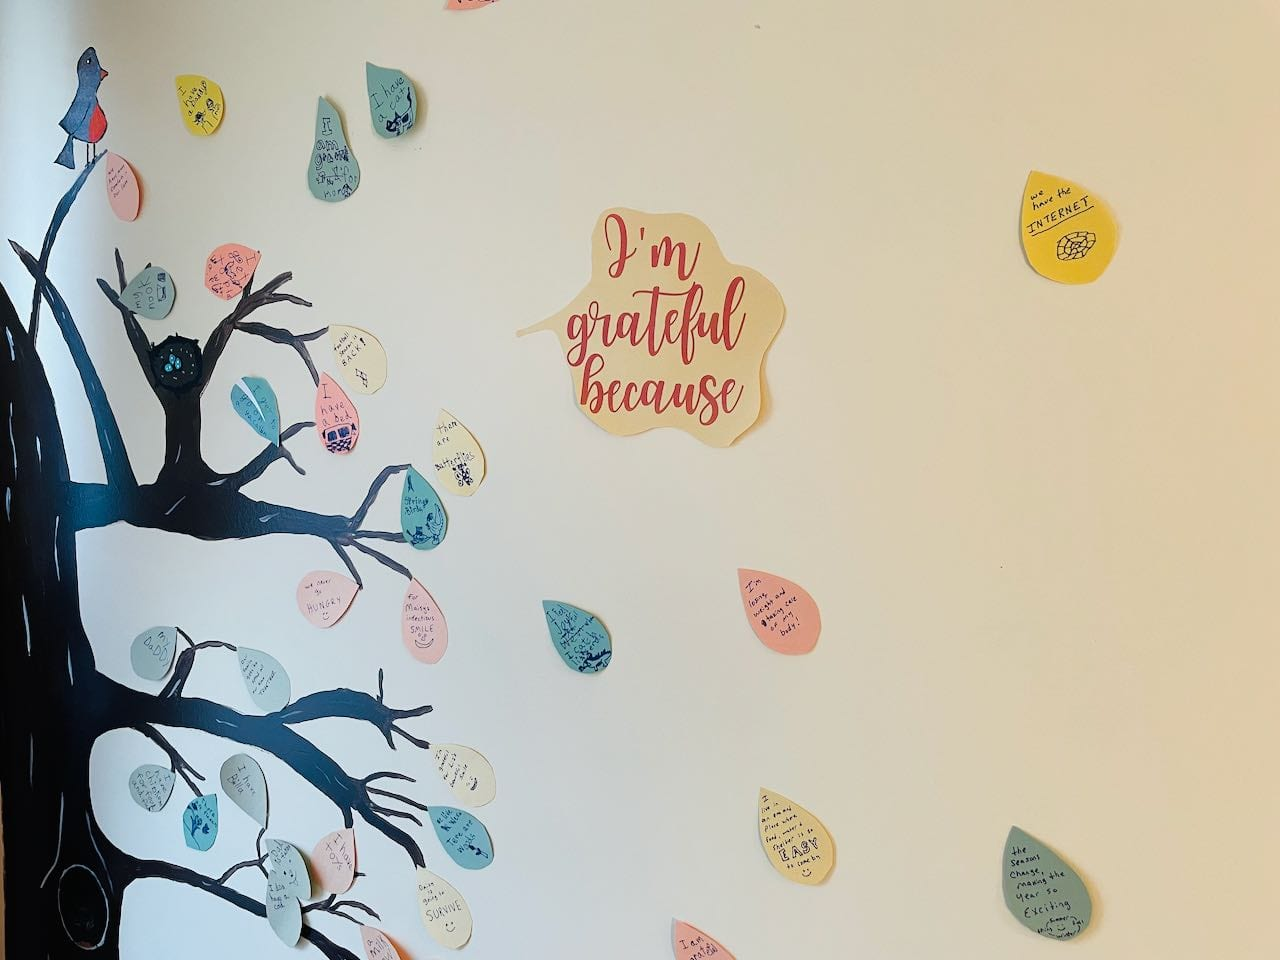 our gratitude tree